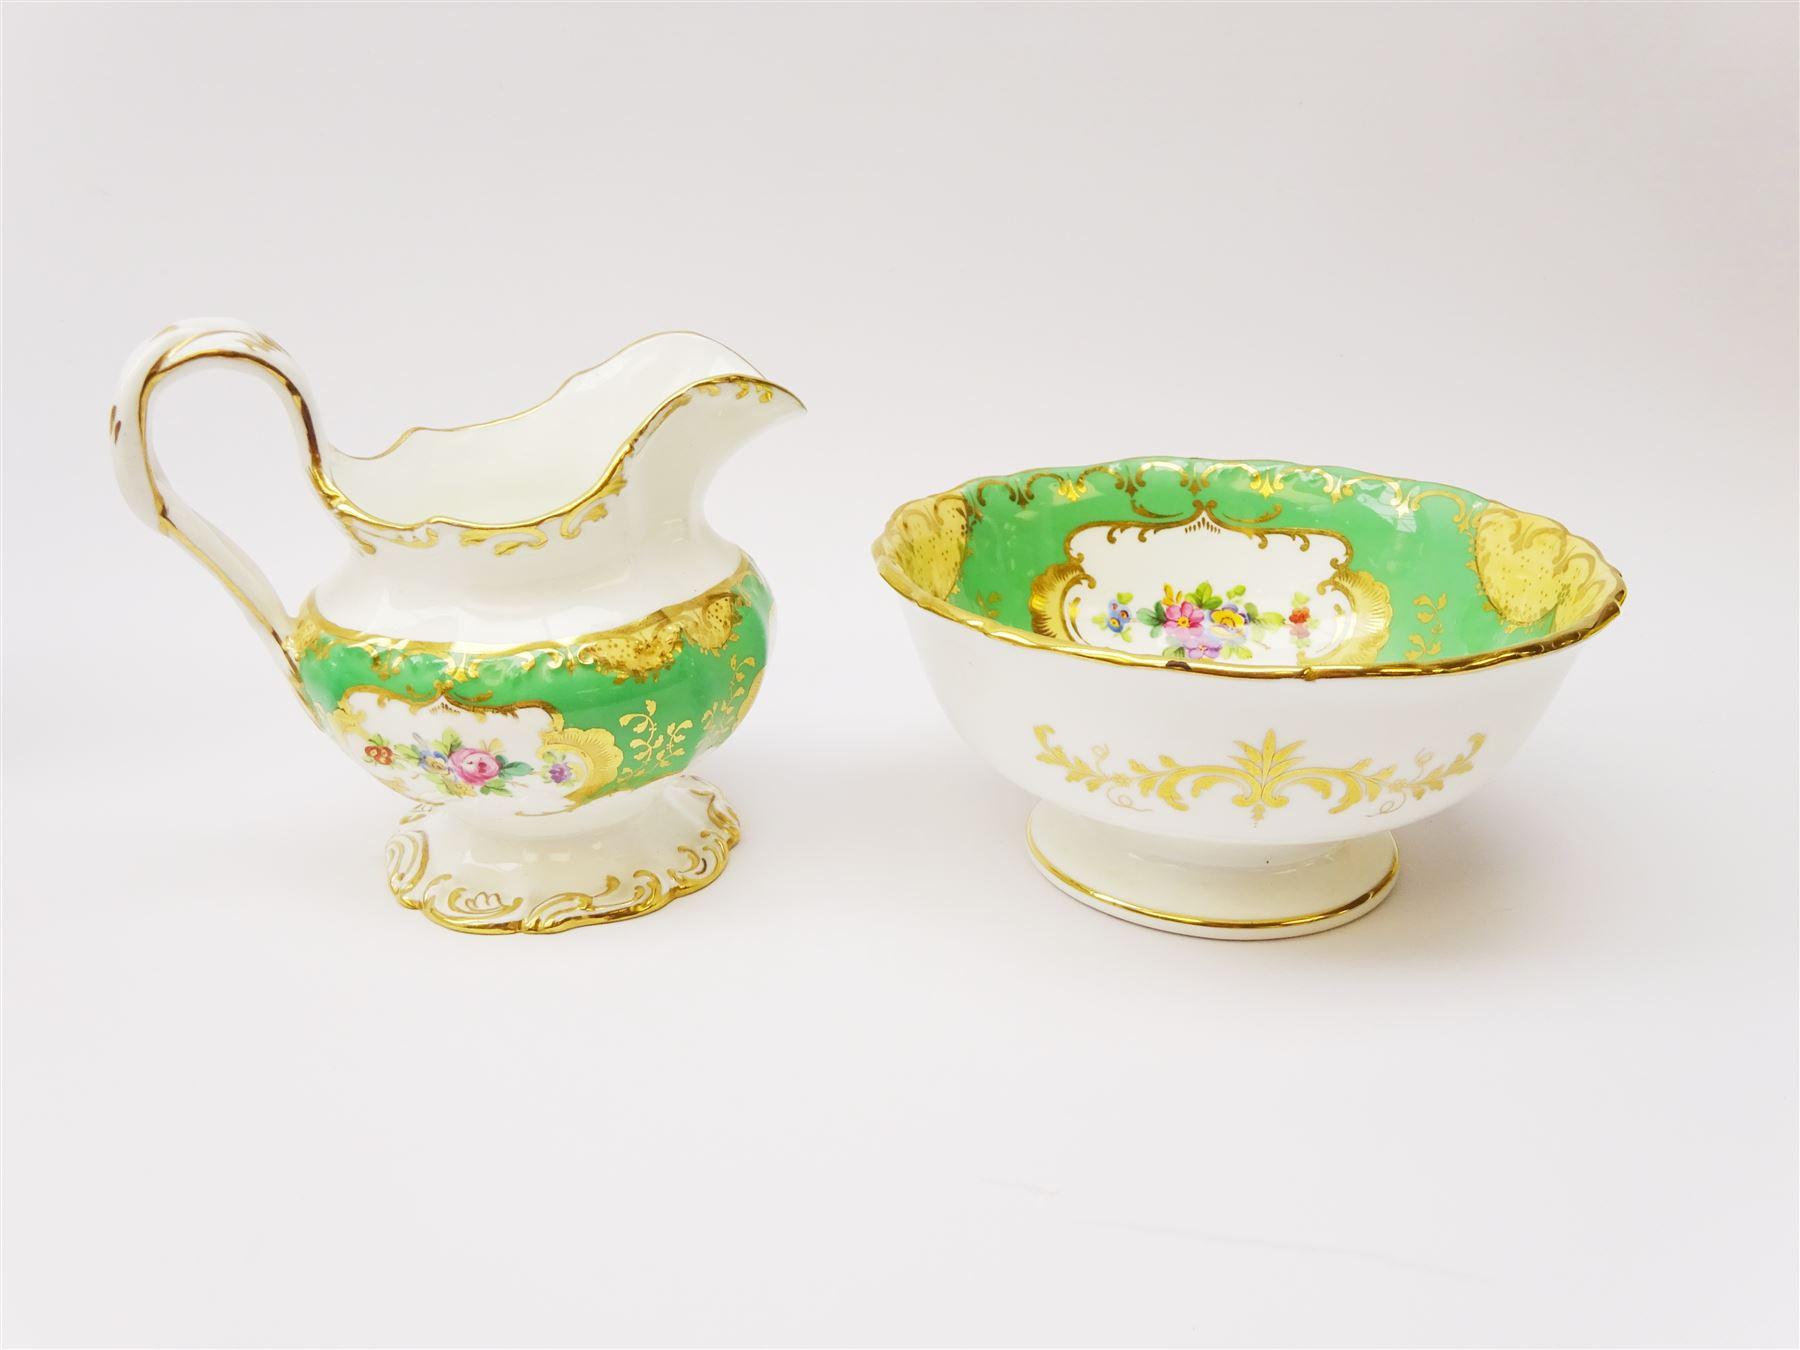 19th century Minton tea set - Image 9 of 12